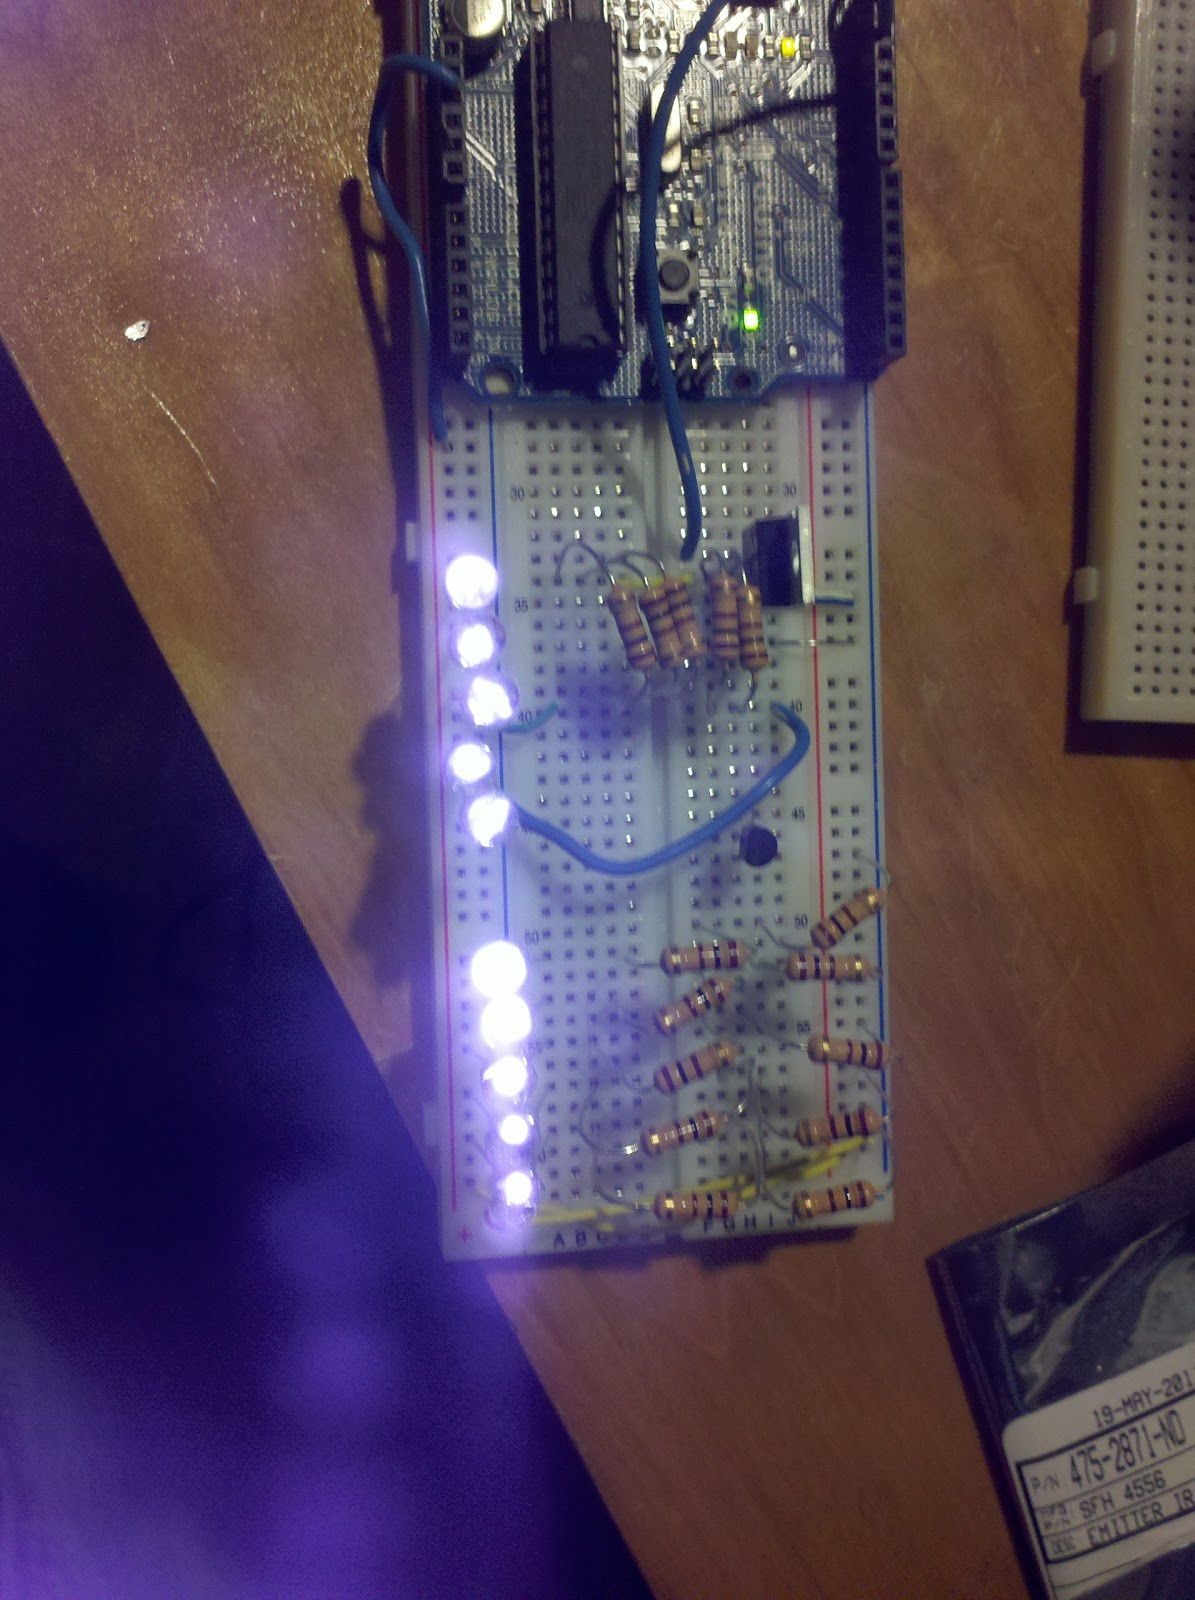 Siliconfish: IR LED speed/red light license plate photo blocker